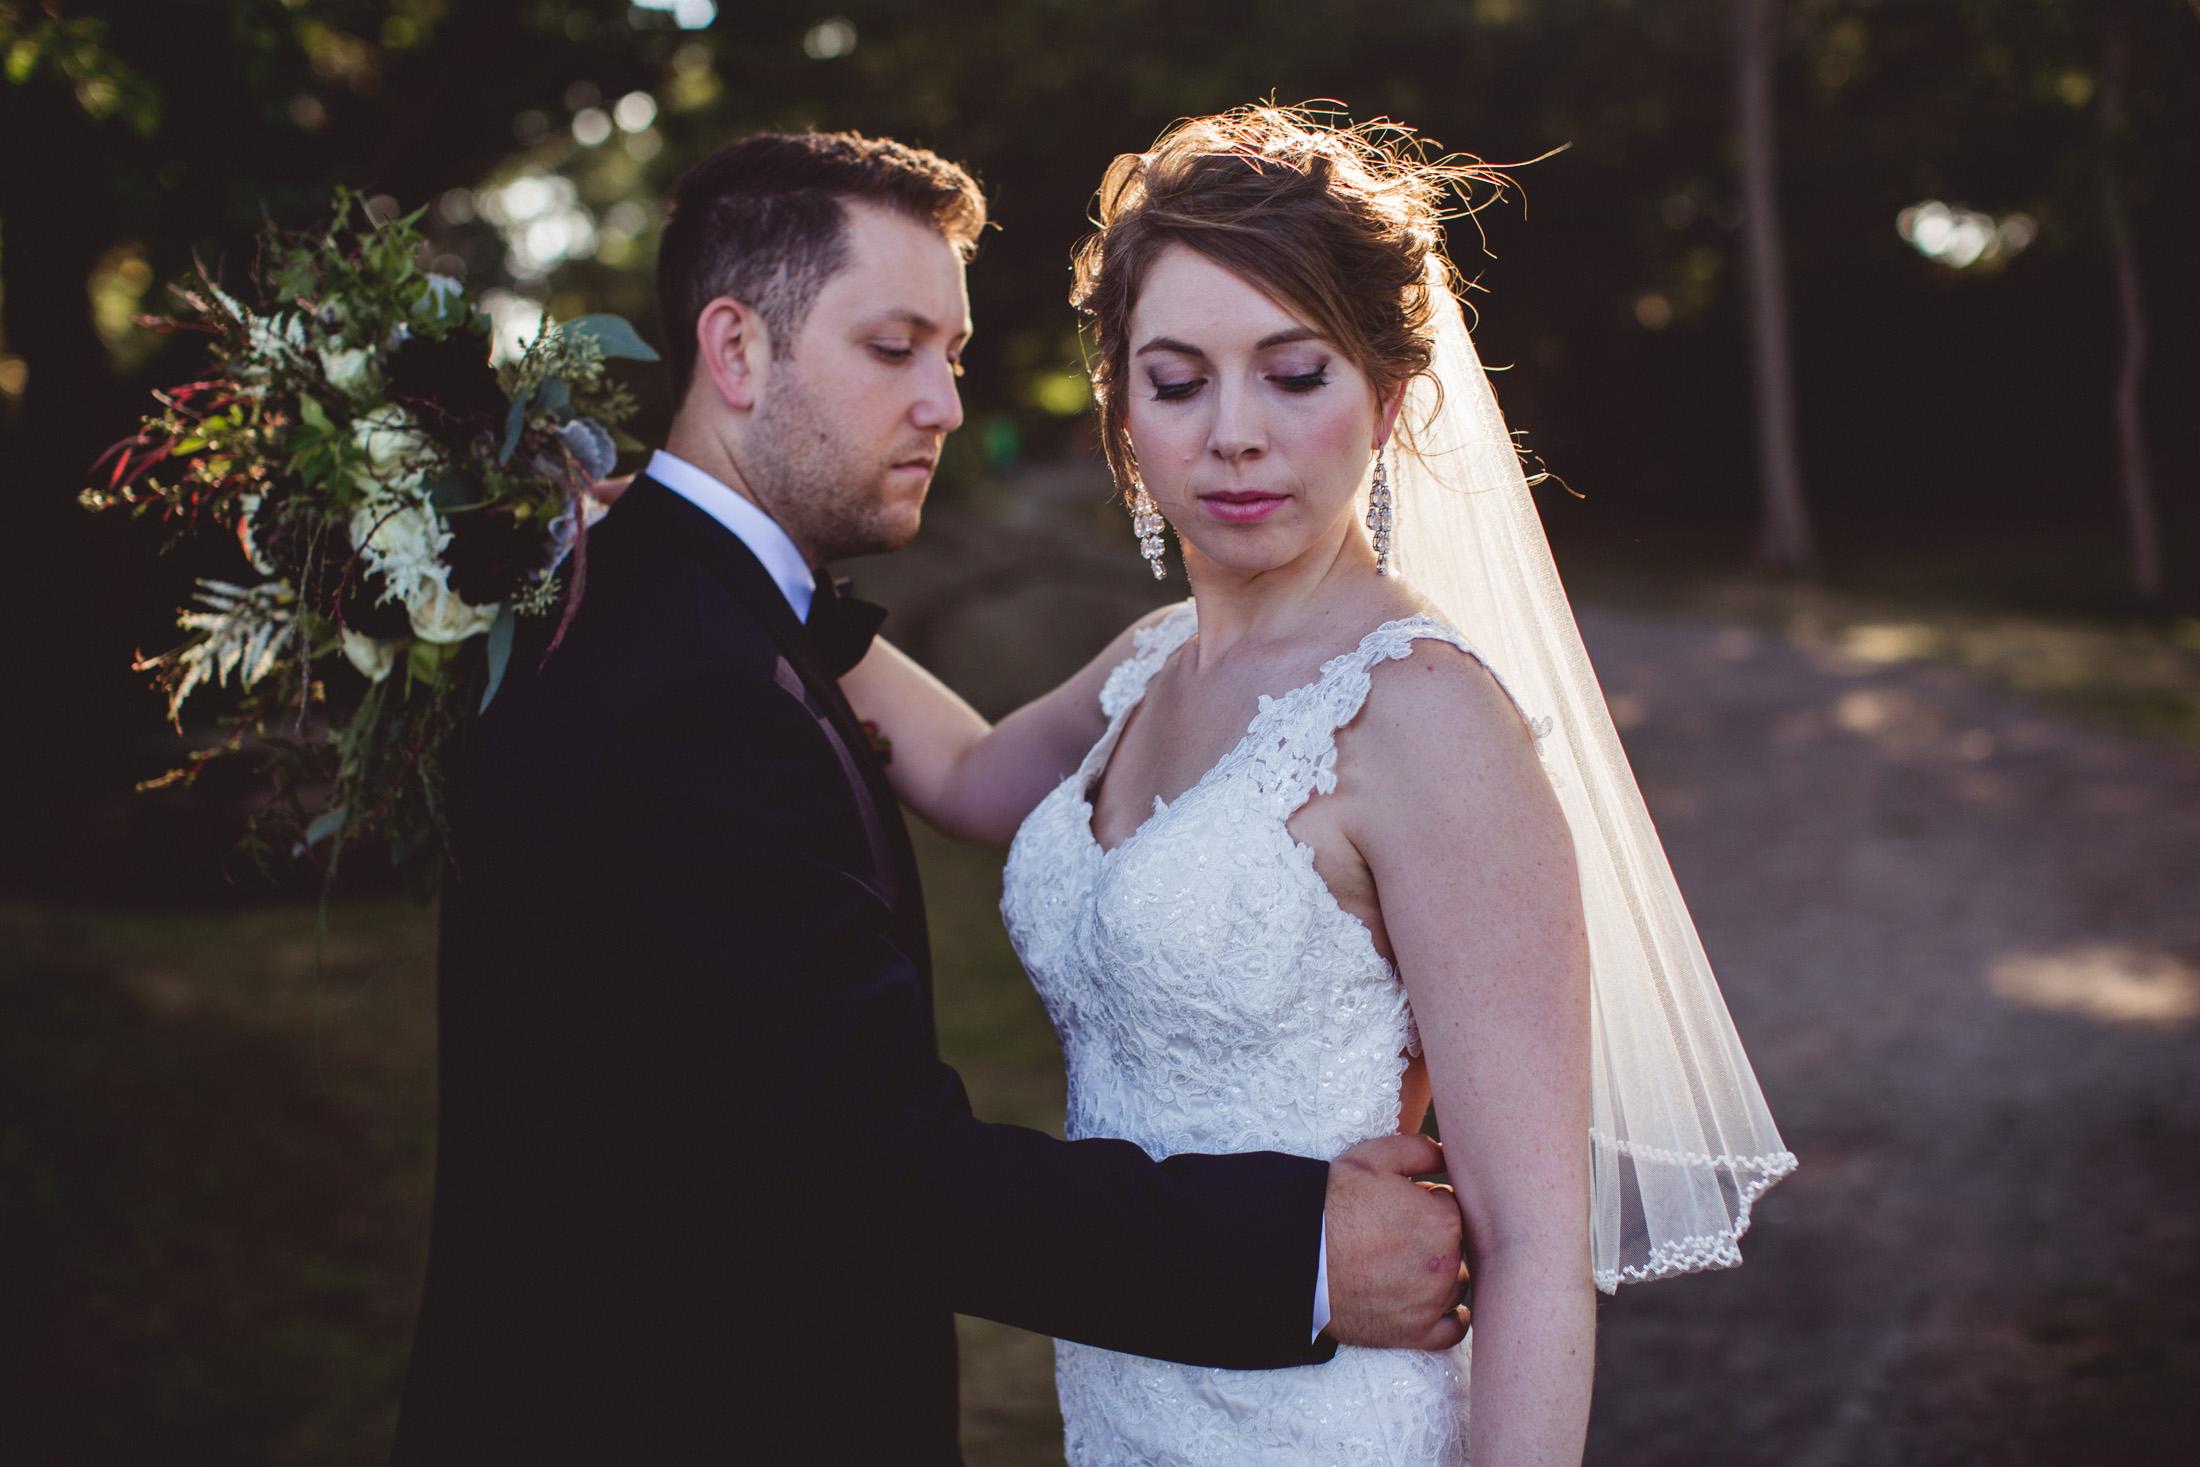 Cruiseport-Wedding-Photographer-11.jpg